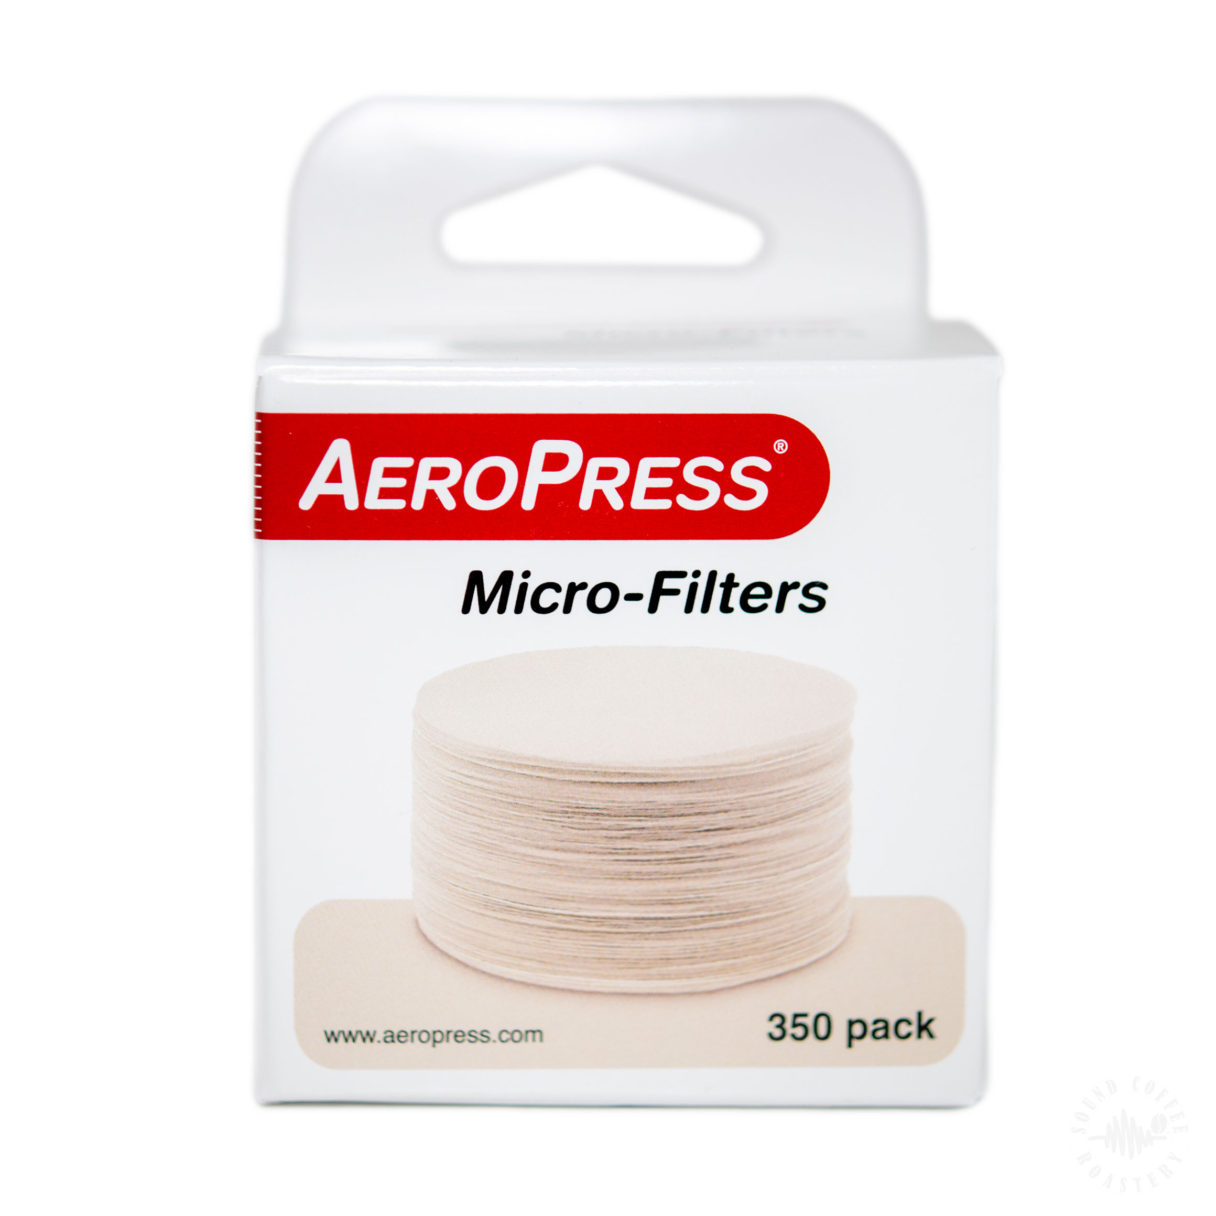 Aeropress micro-filters